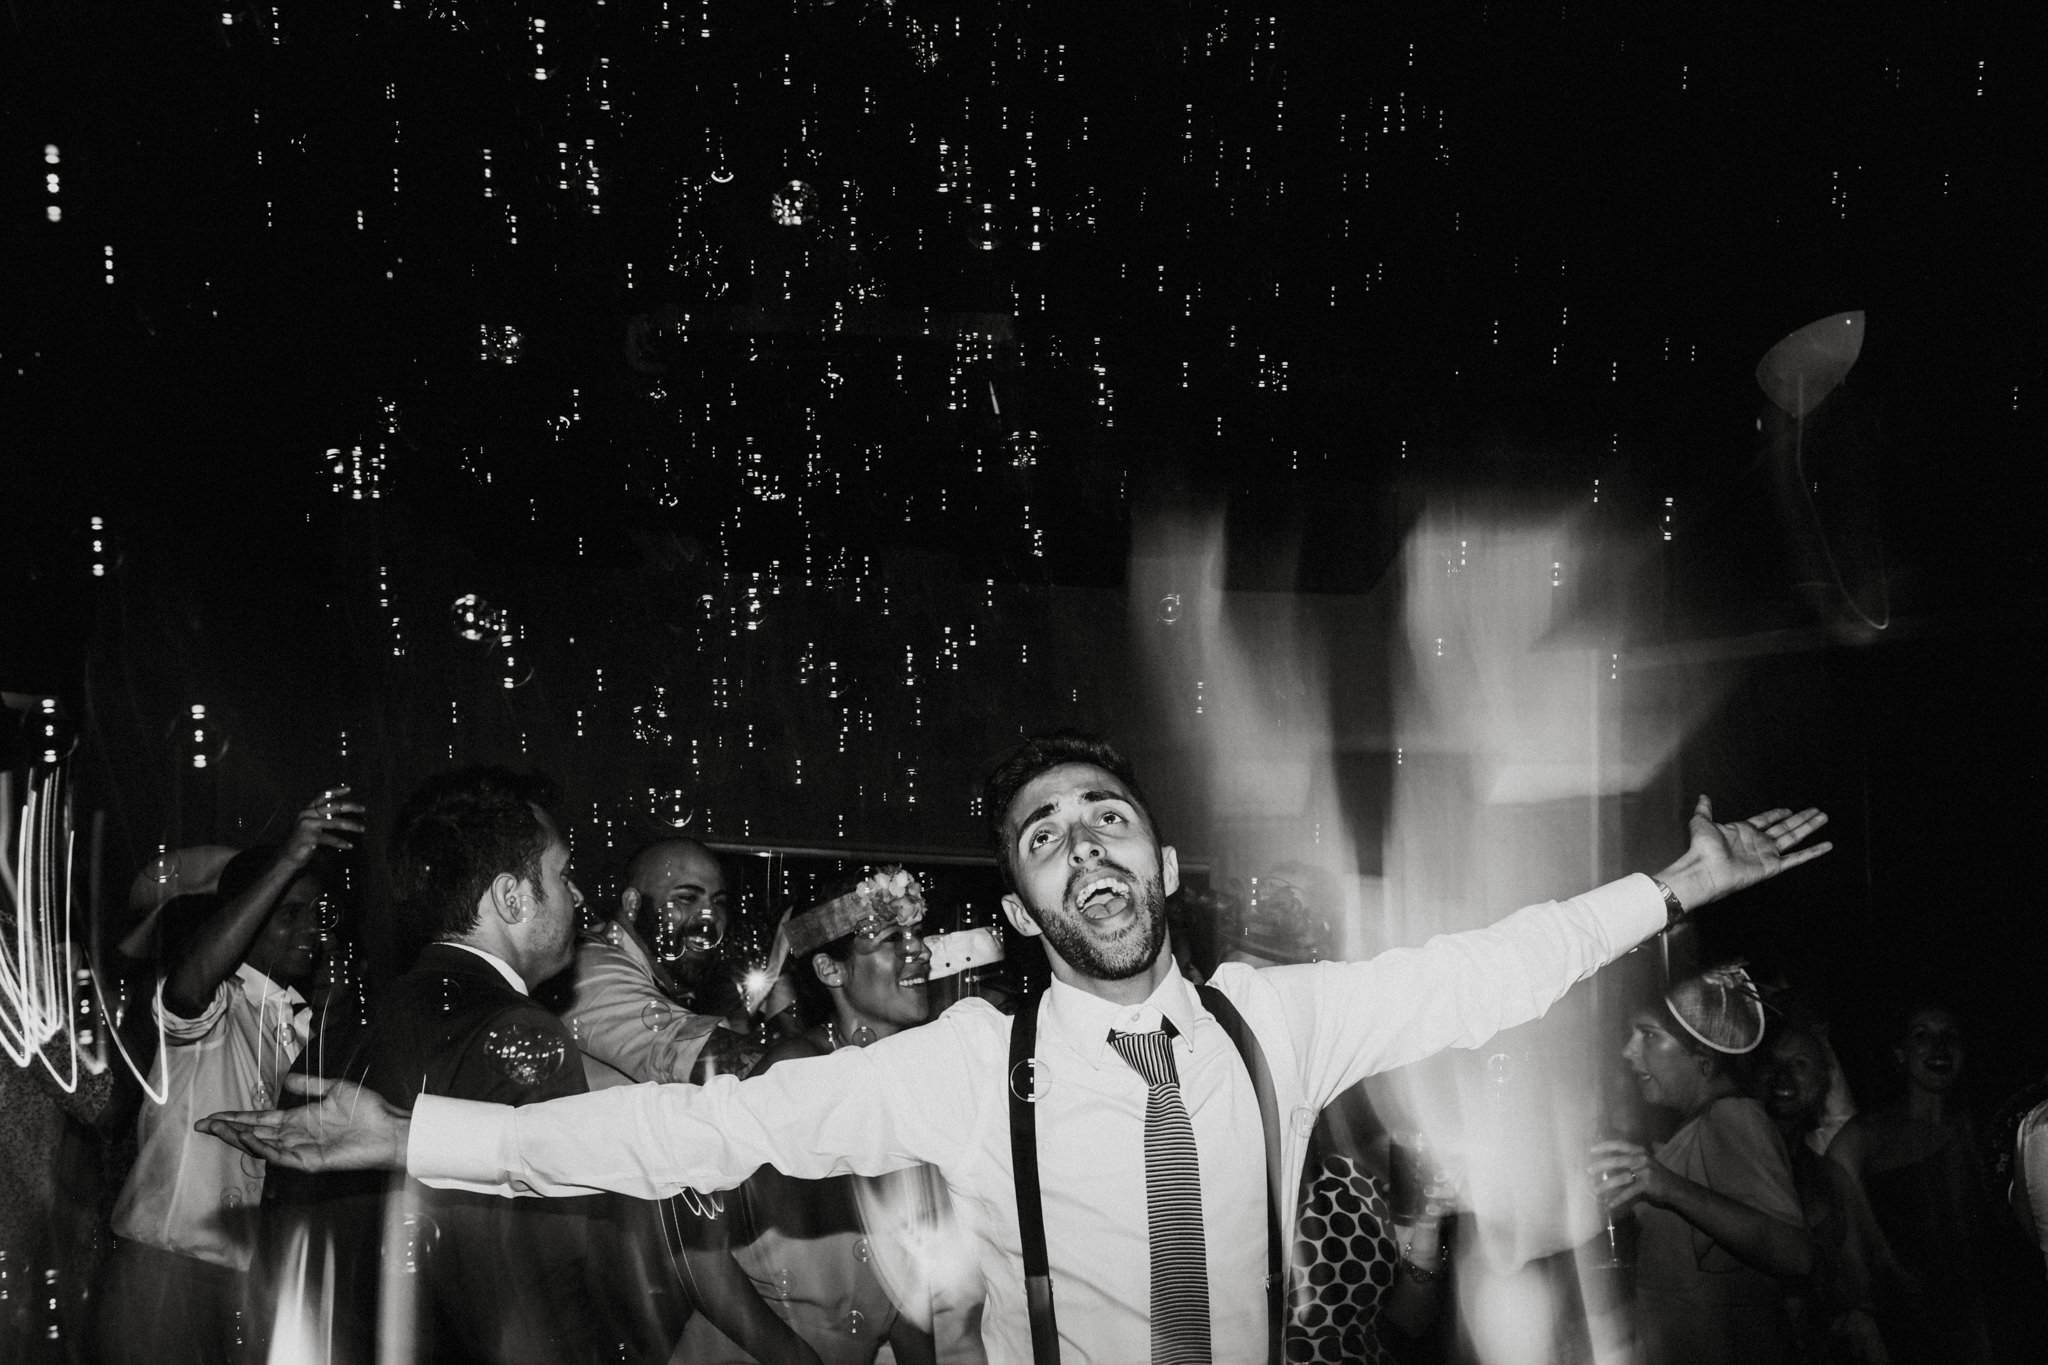 boda-diferente-fotografo-boda-laspalmas-grancanaria-98